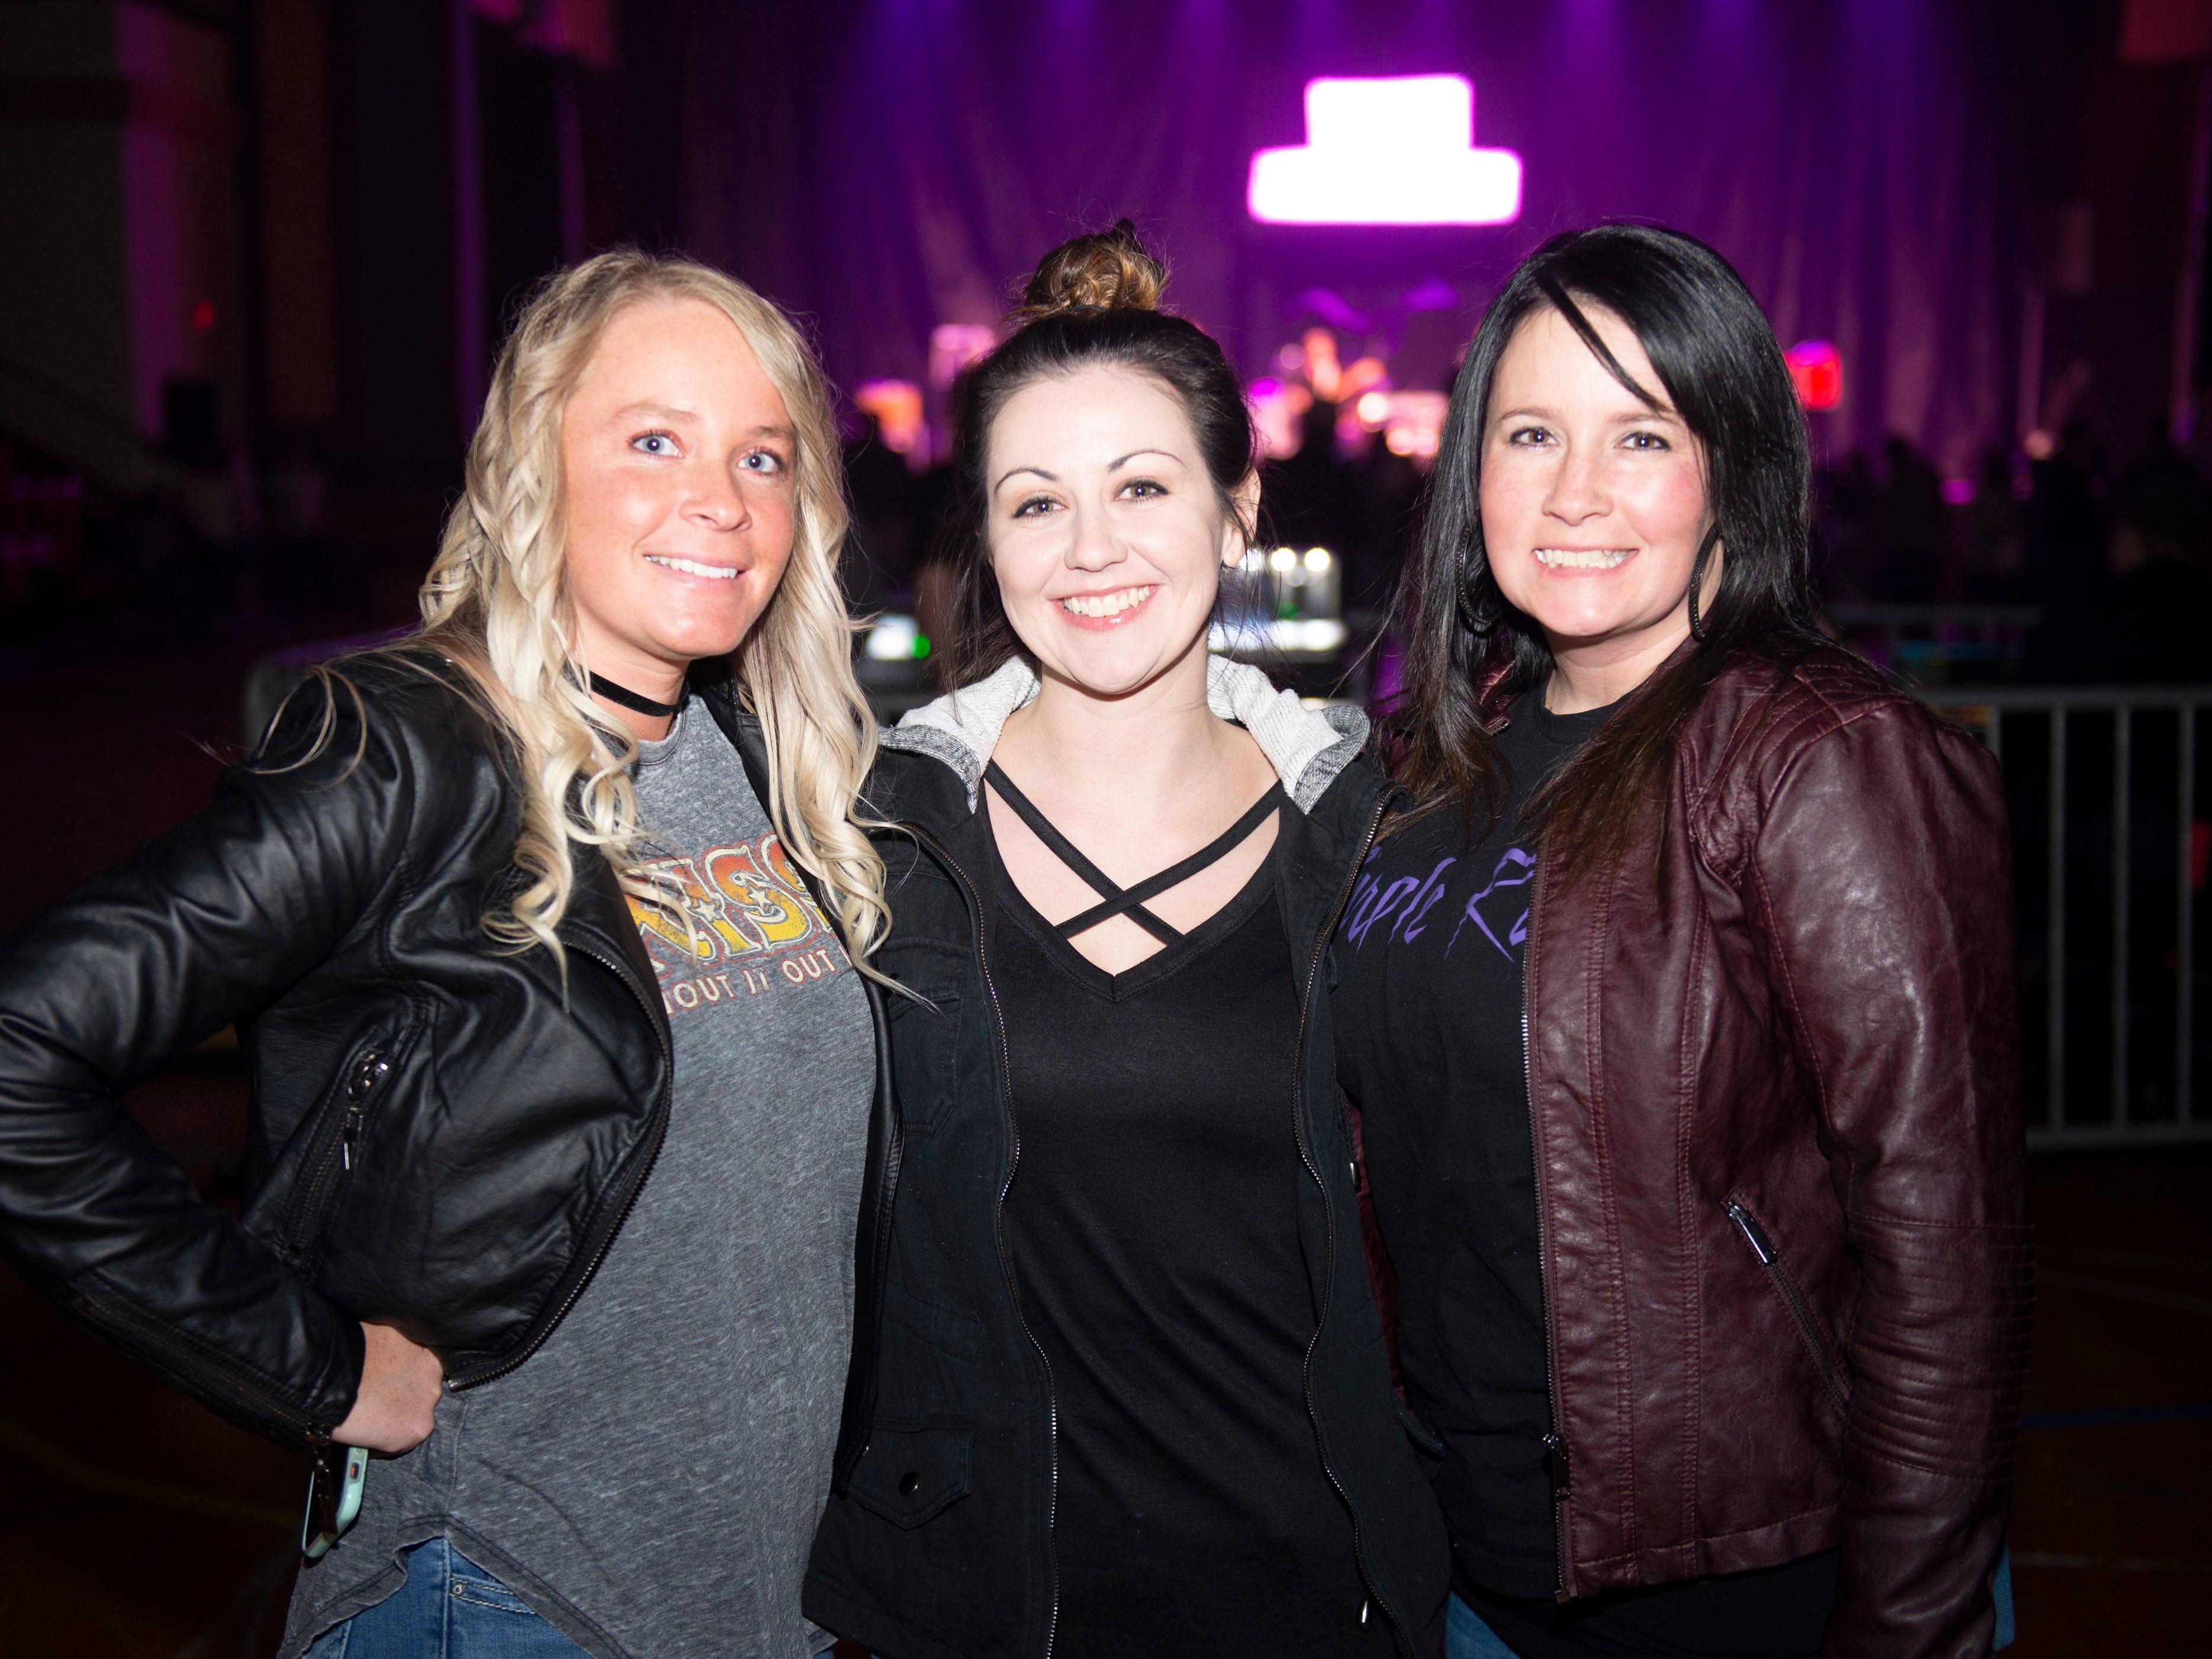 Samantha Wright, Aimee Farrell, Kami Boothe